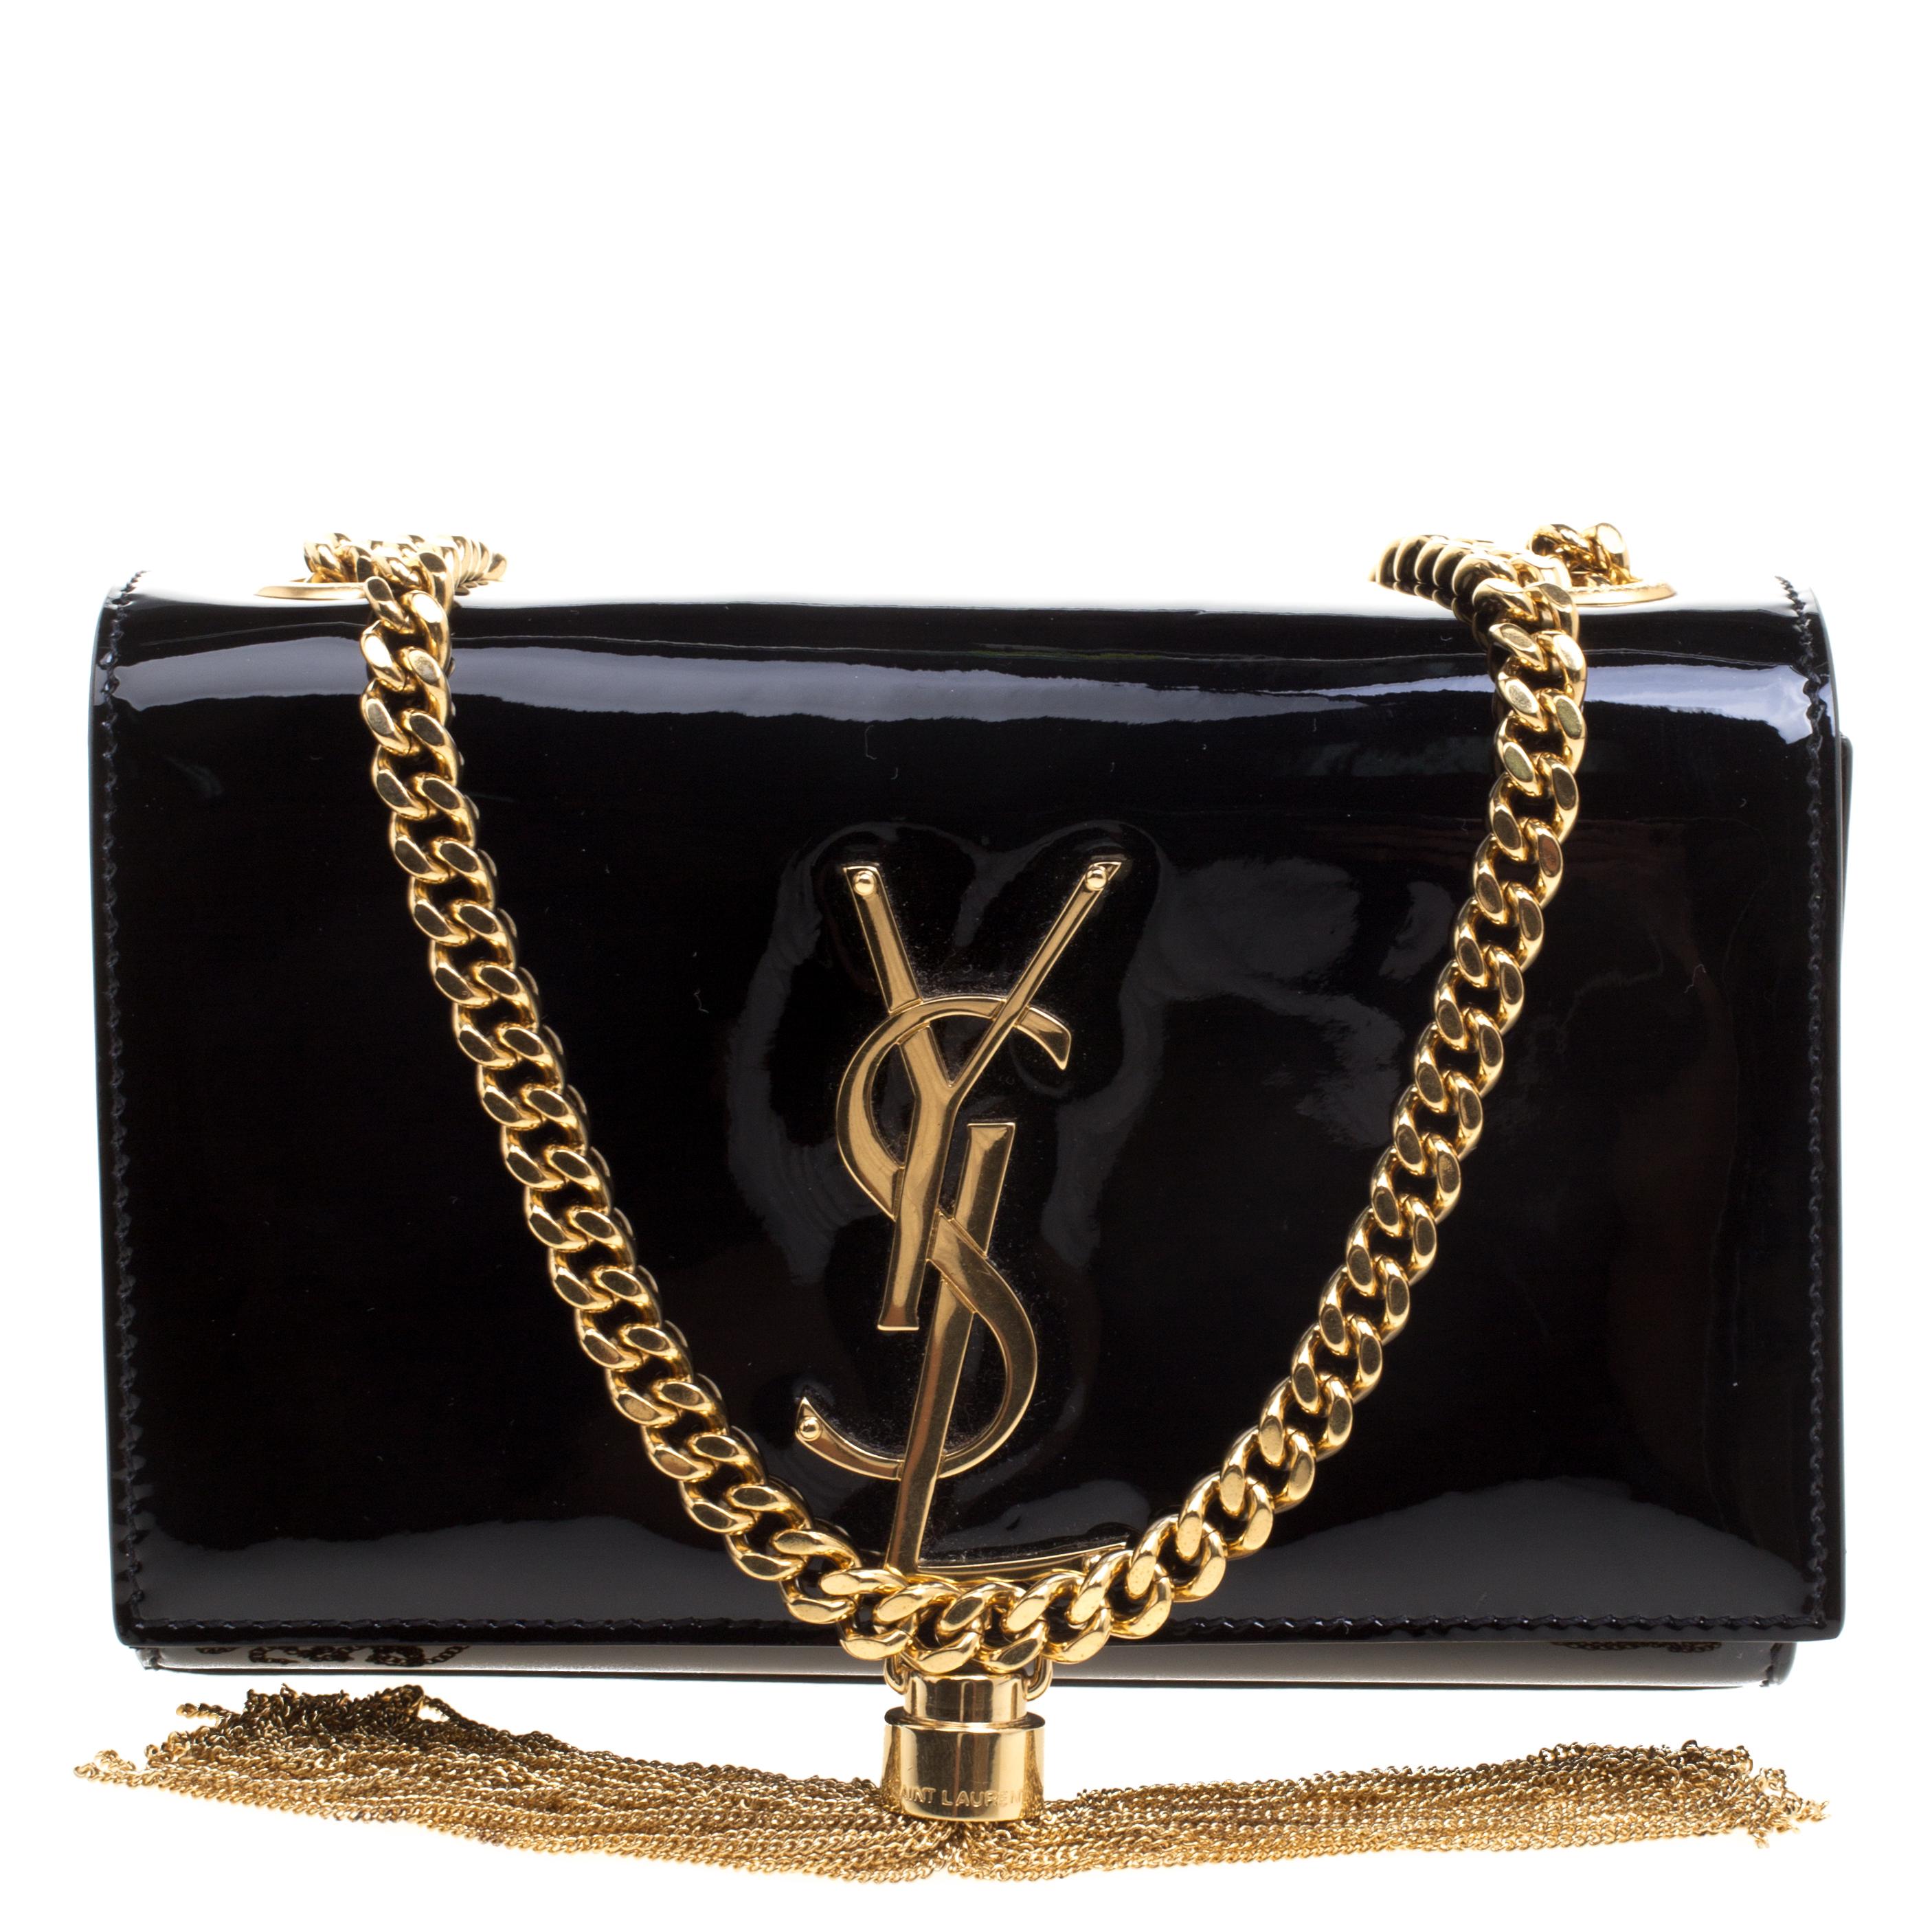 ab3b1c05025 ... Saint Laurent Paris Black Patent Leather Small Kate Tassel Crossbody Bag.  nextprev. prevnext